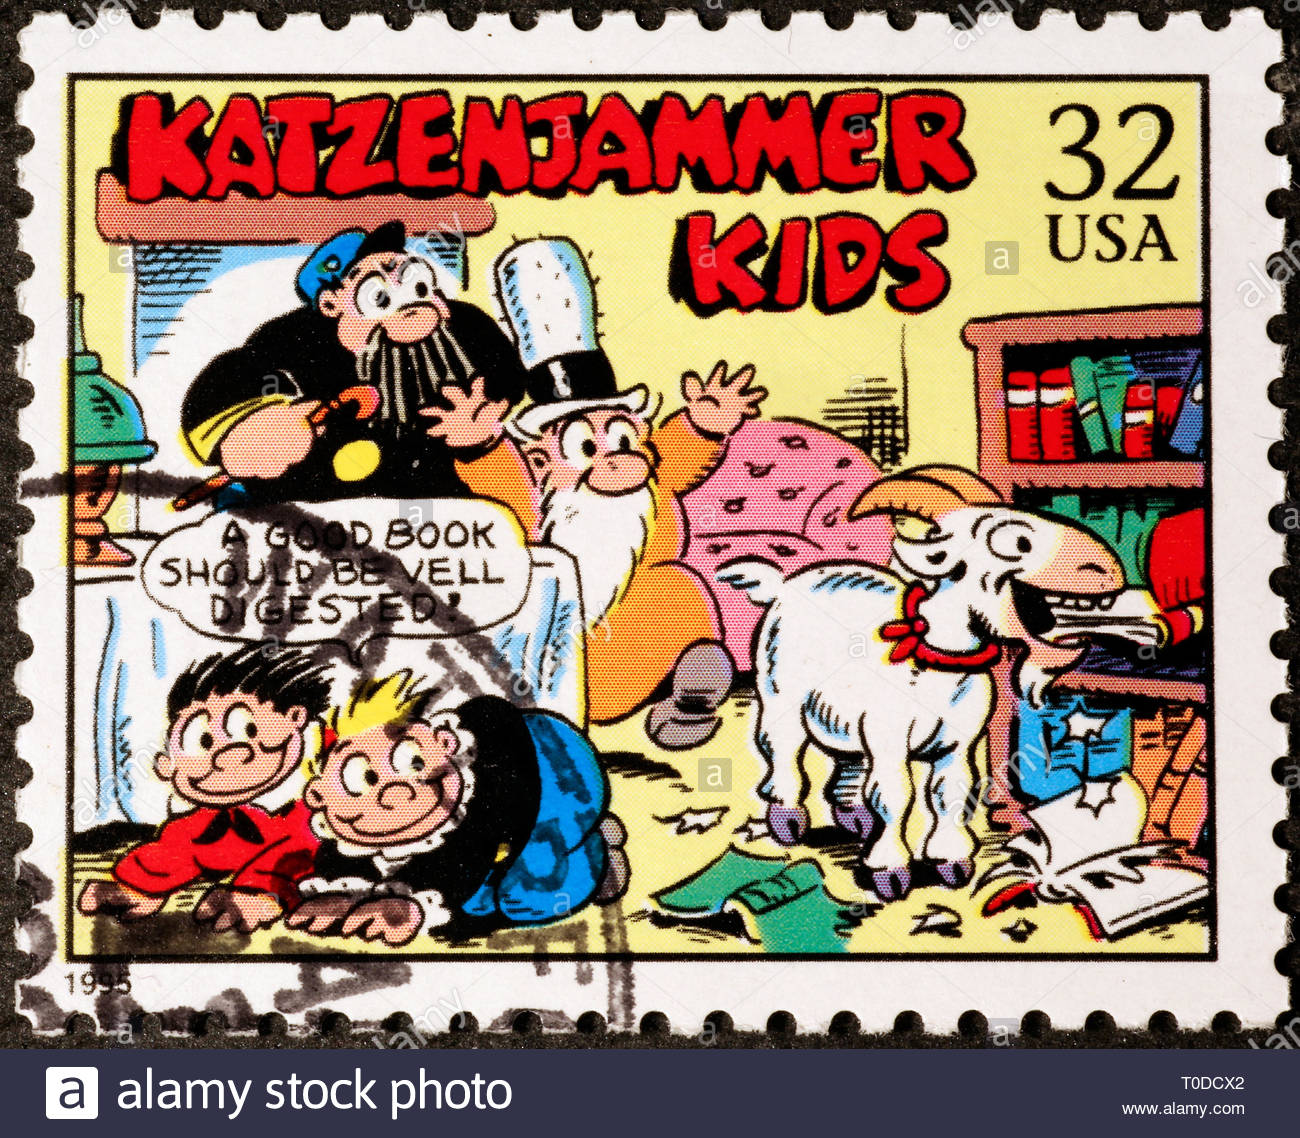 Cartoon Katzenjammer kids on american postage stamp - Stock Image